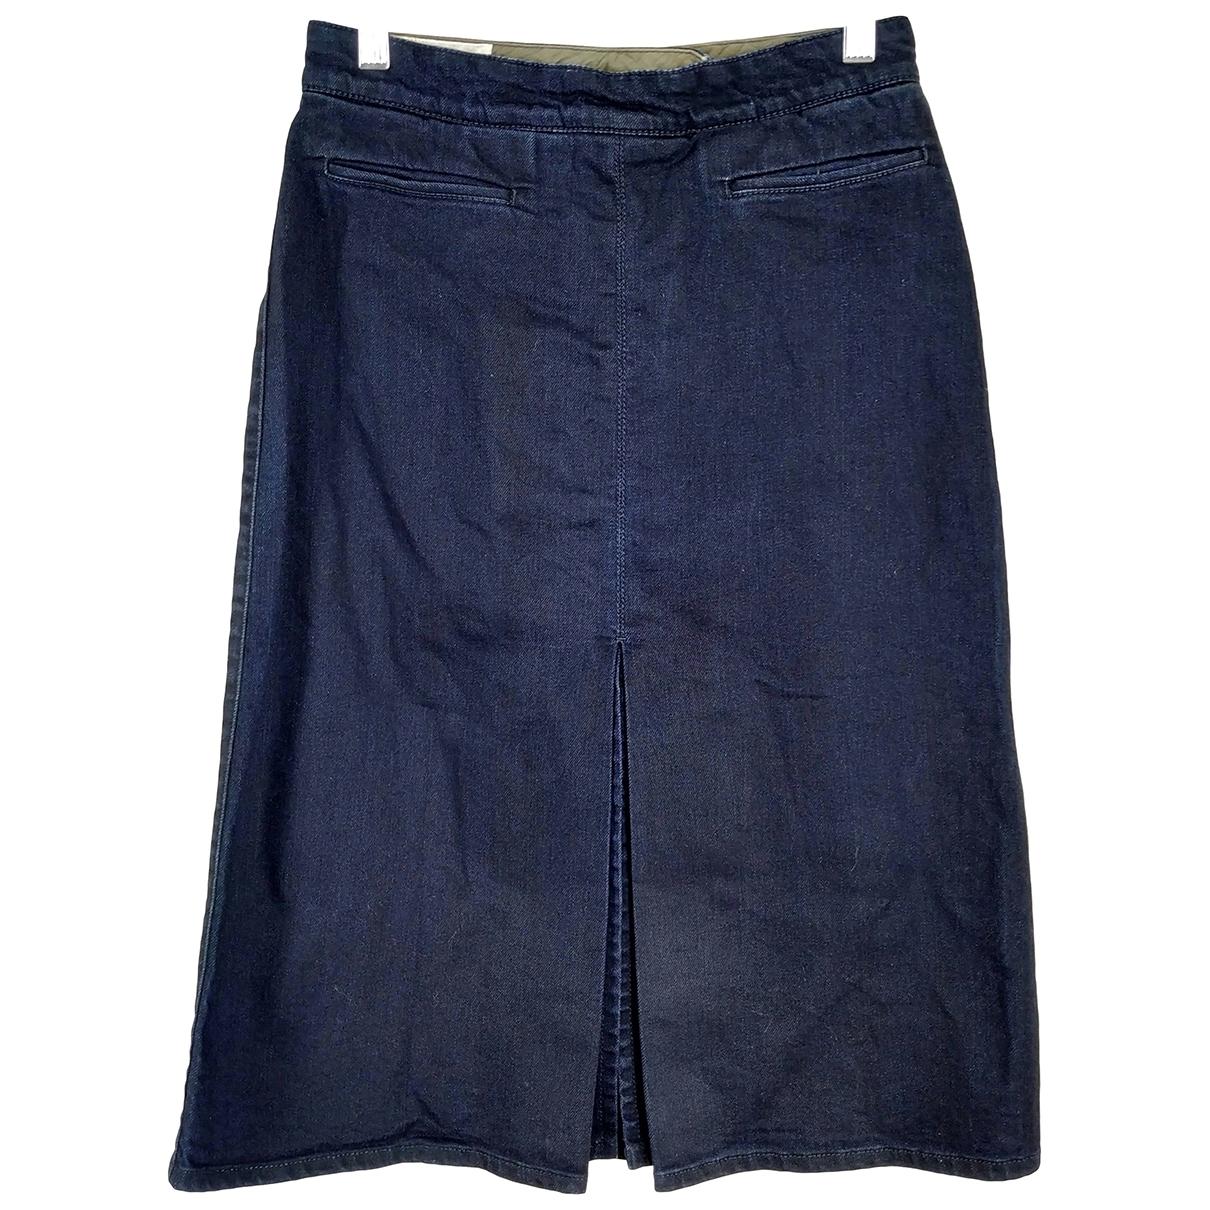 Stella Mccartney - Jupe   pour femme en denim - bleu